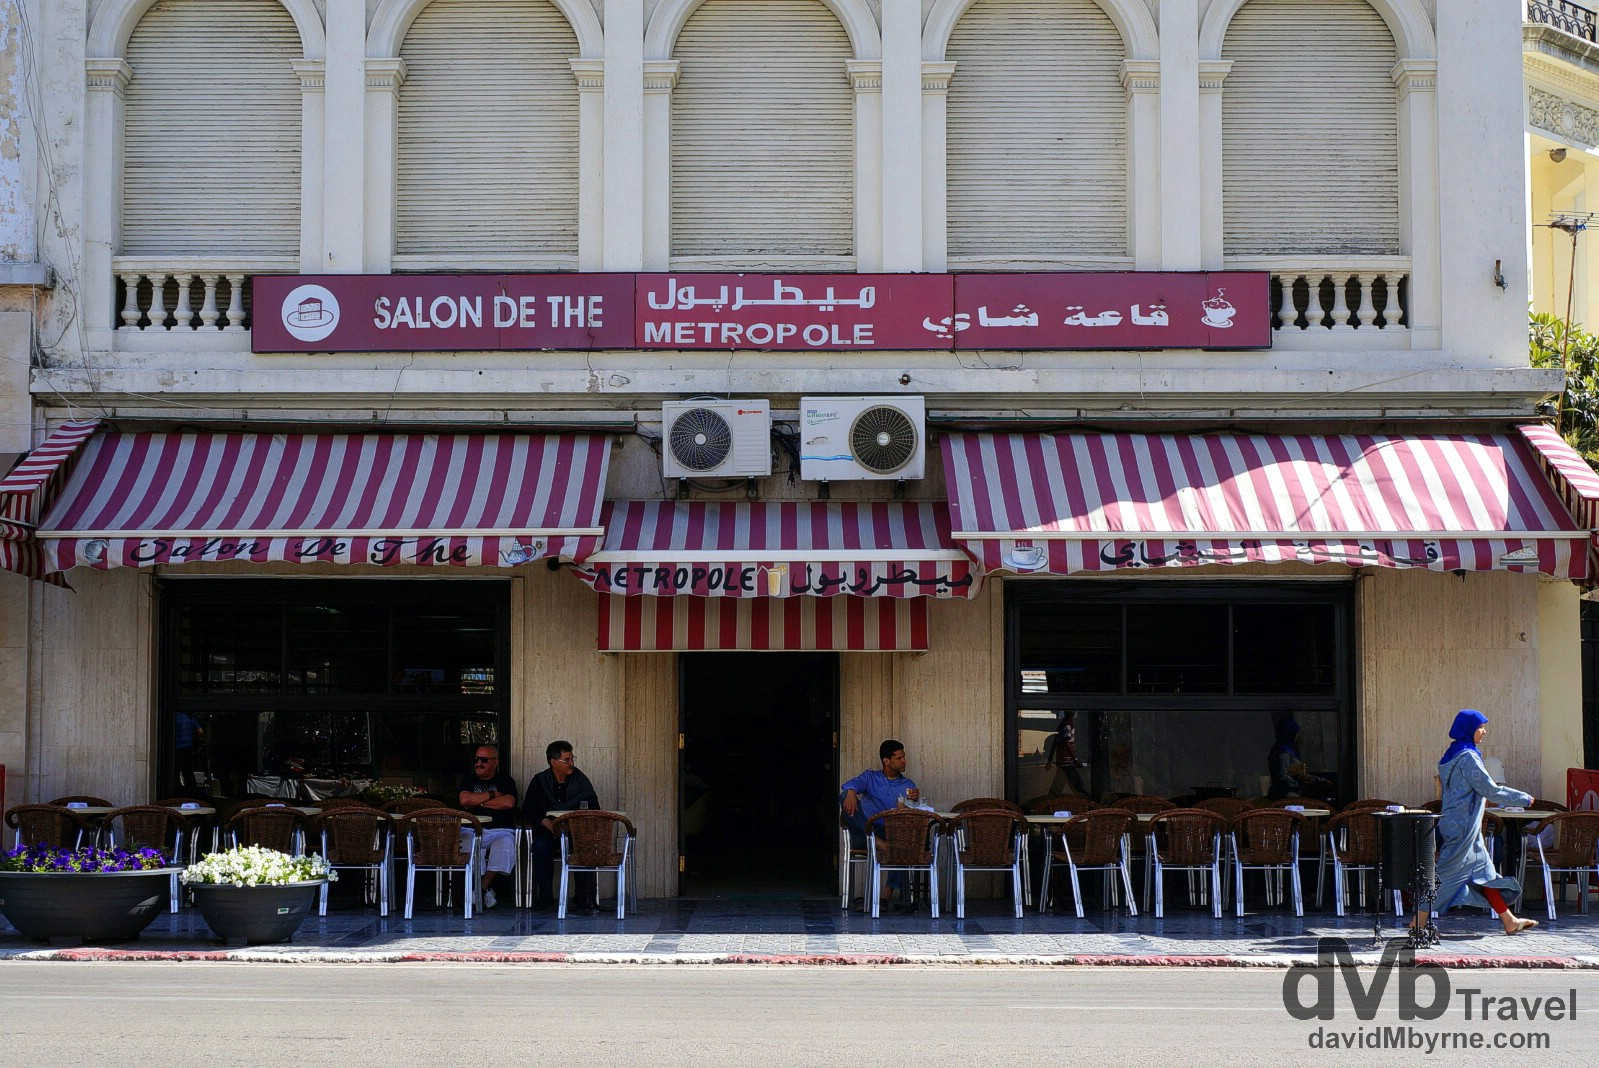 Cafe Metropole, Boulevard Pasteur, Tangier, Morocco. June 4th, 2014.